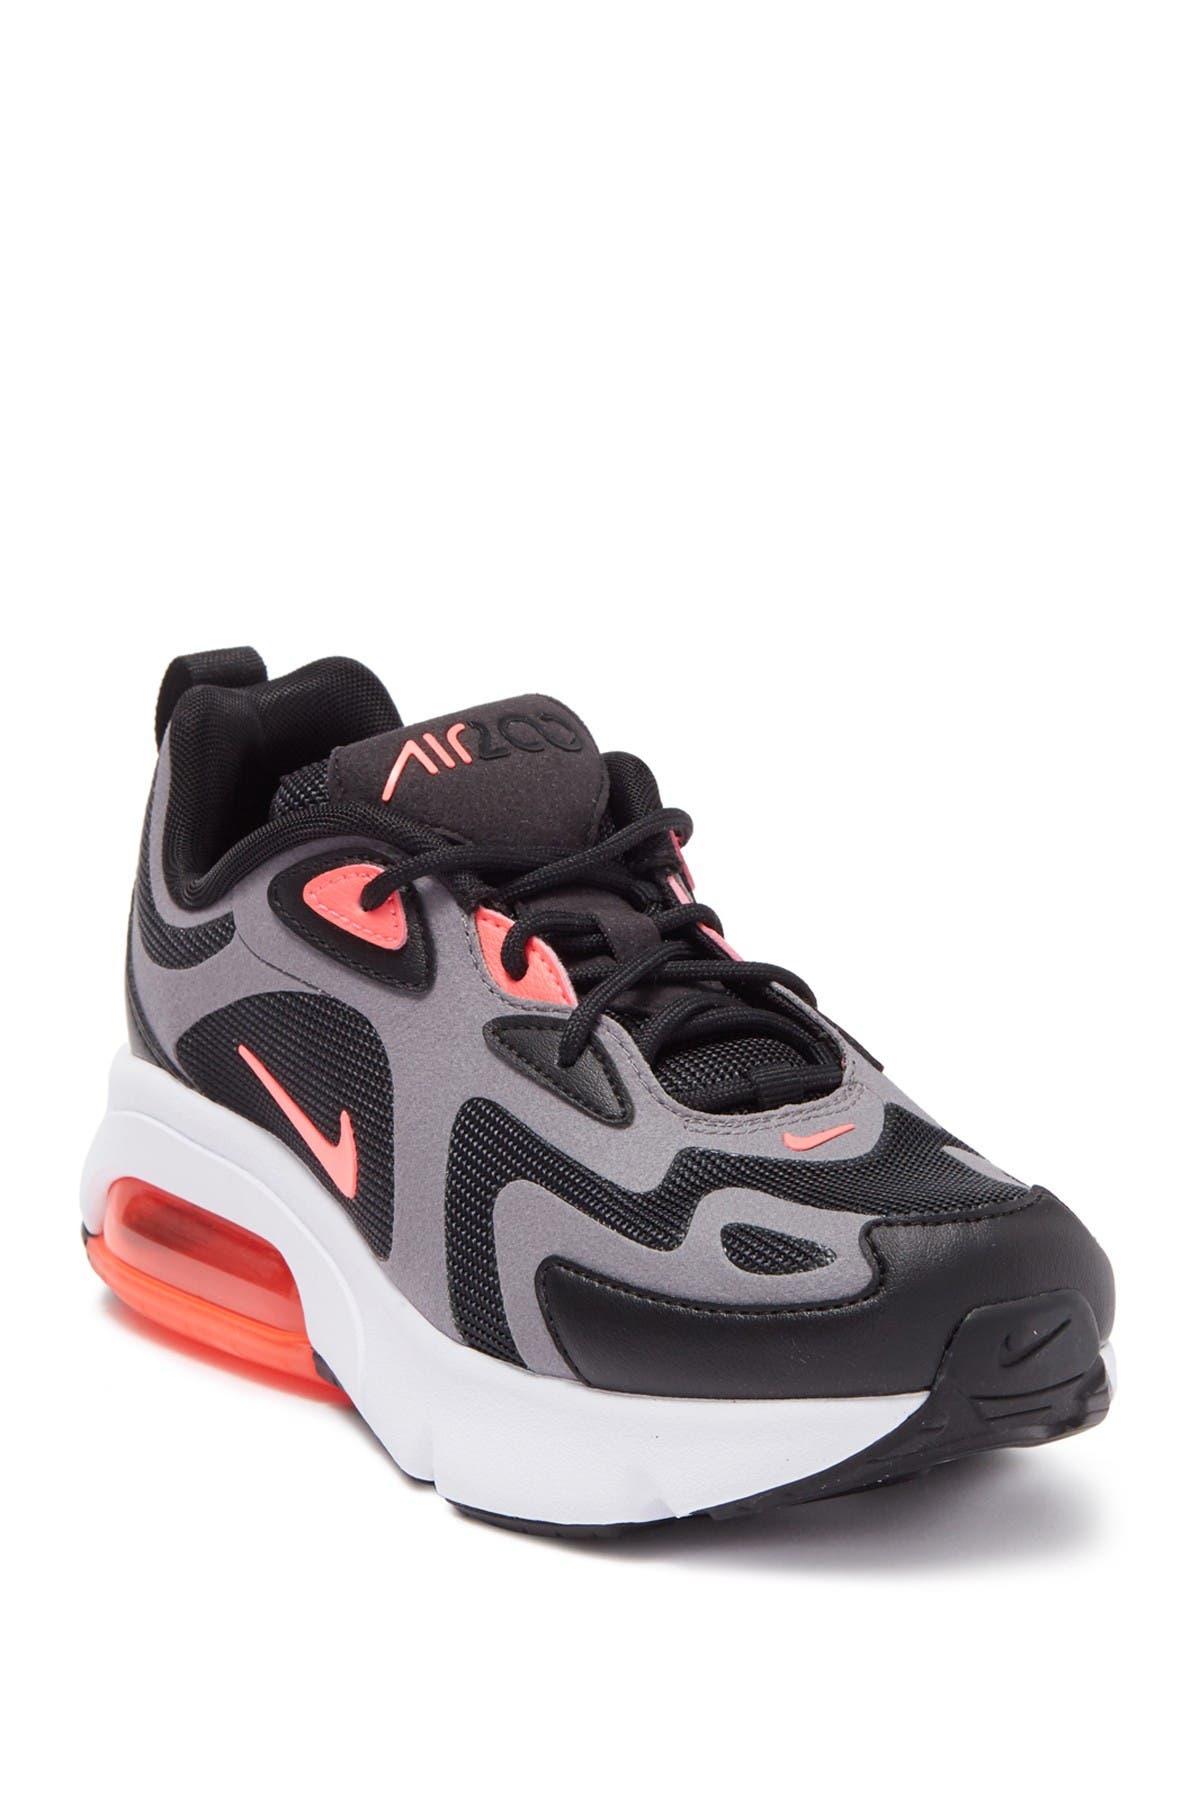 Nike | Air Max 200 GS Sneaker